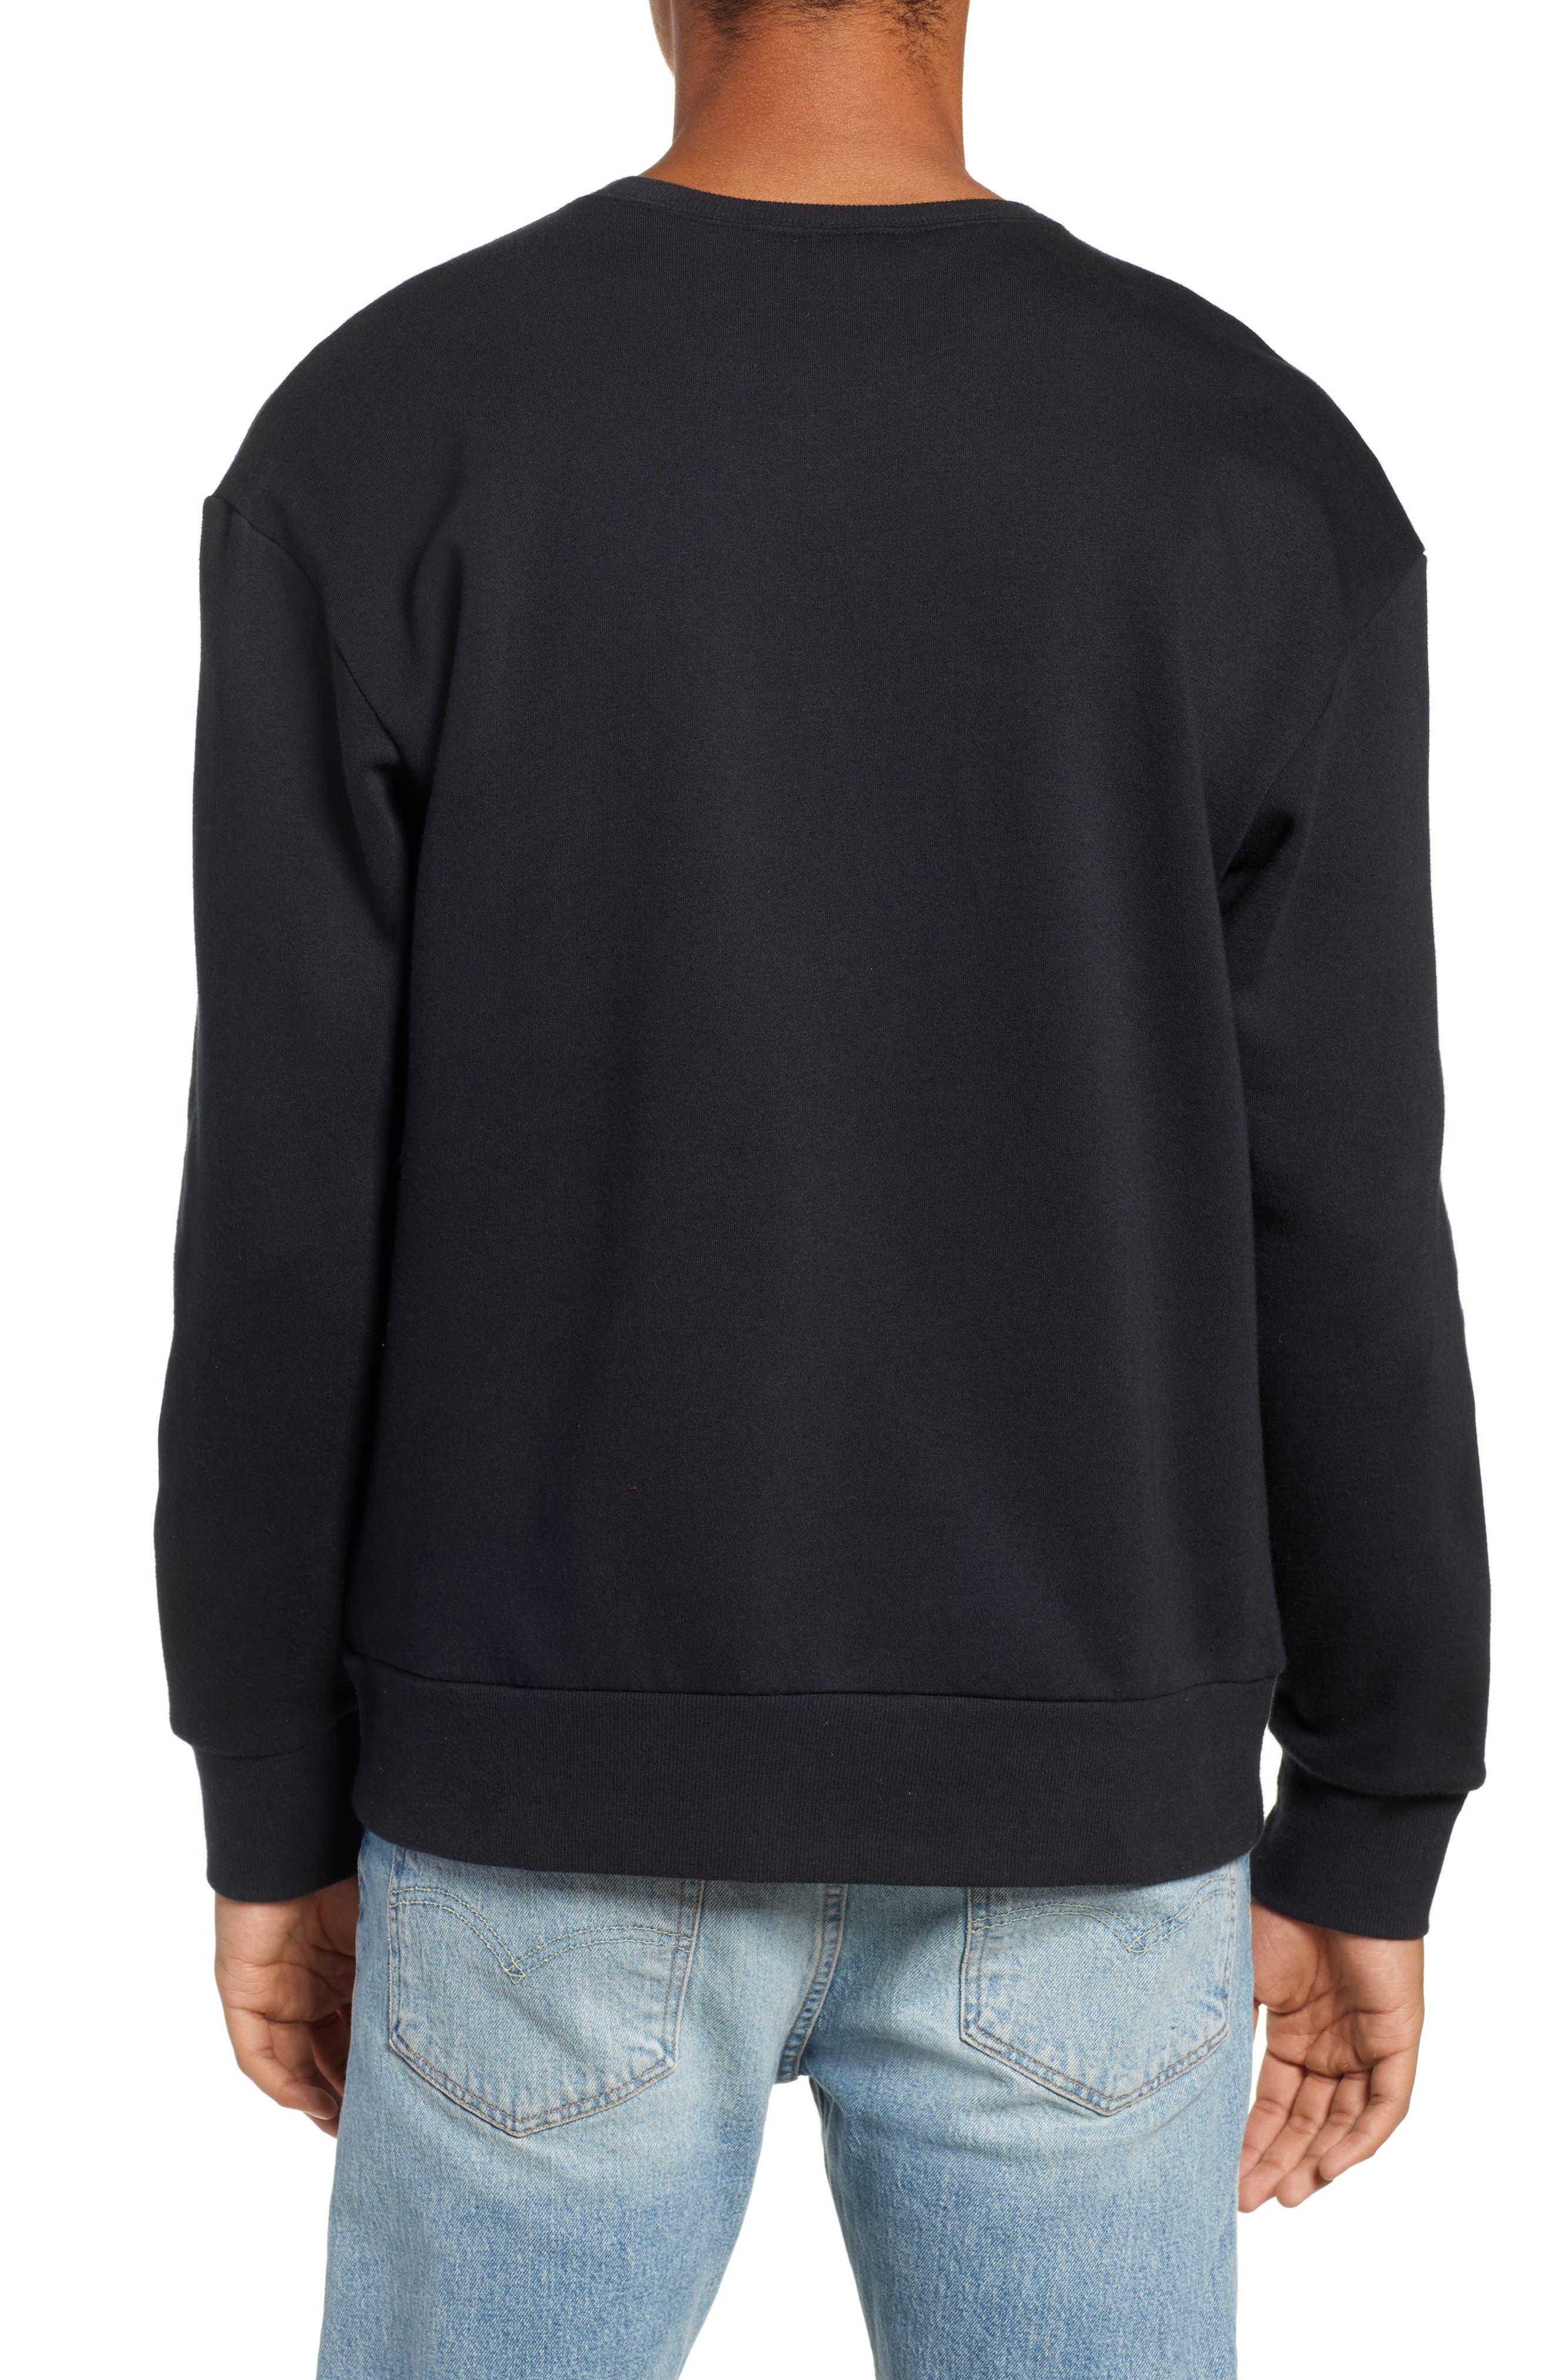 Bugasweat Crewneck Sweatshirt,                             Alternate thumbnail 2, color,                             BLACK